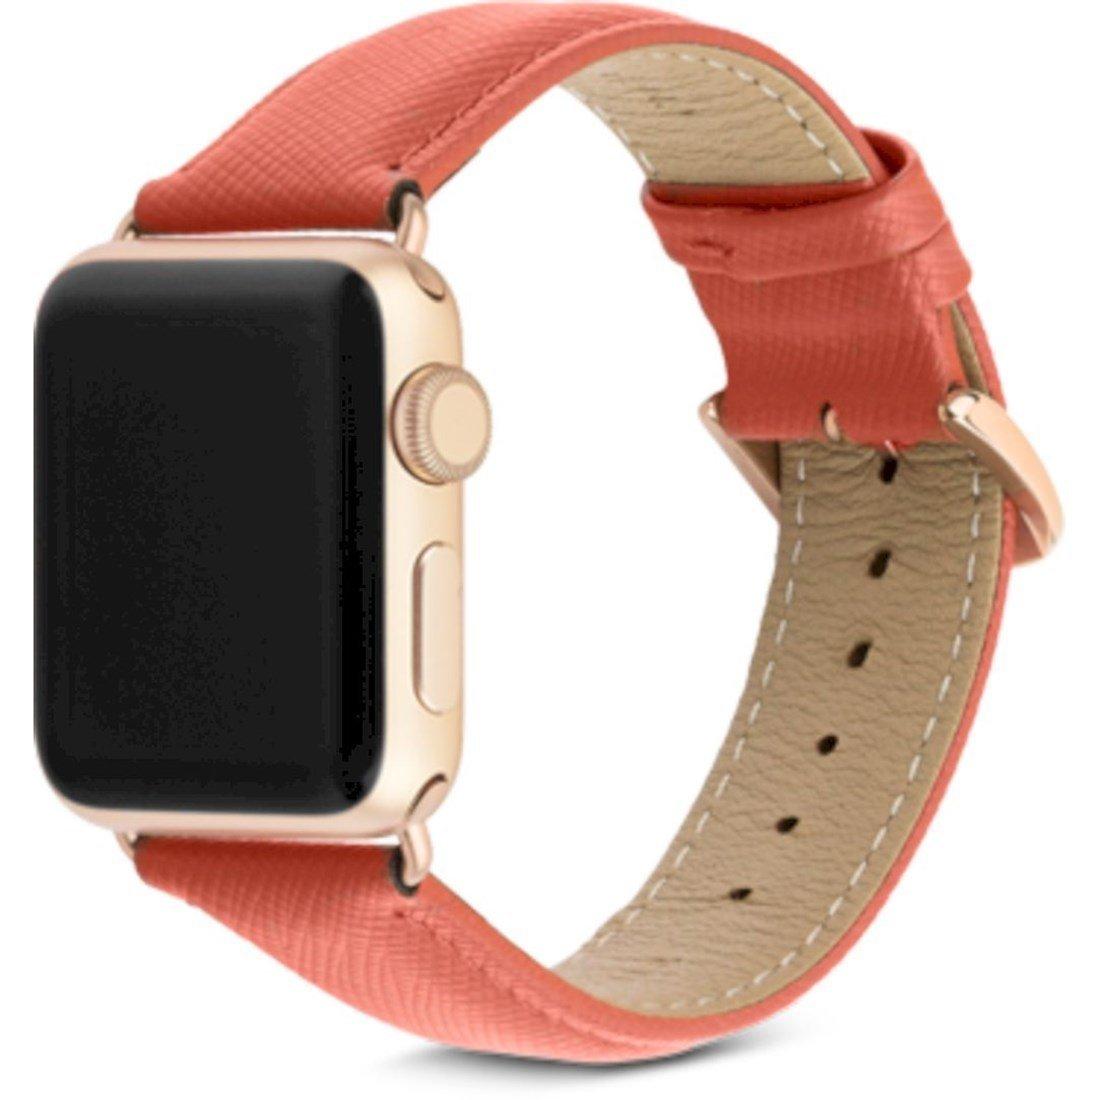 dbramante1928 Apple Watch (38-40mm.) Dbramante1928 Mode Watch Strap Reim M. Pinner - Rusty Rose